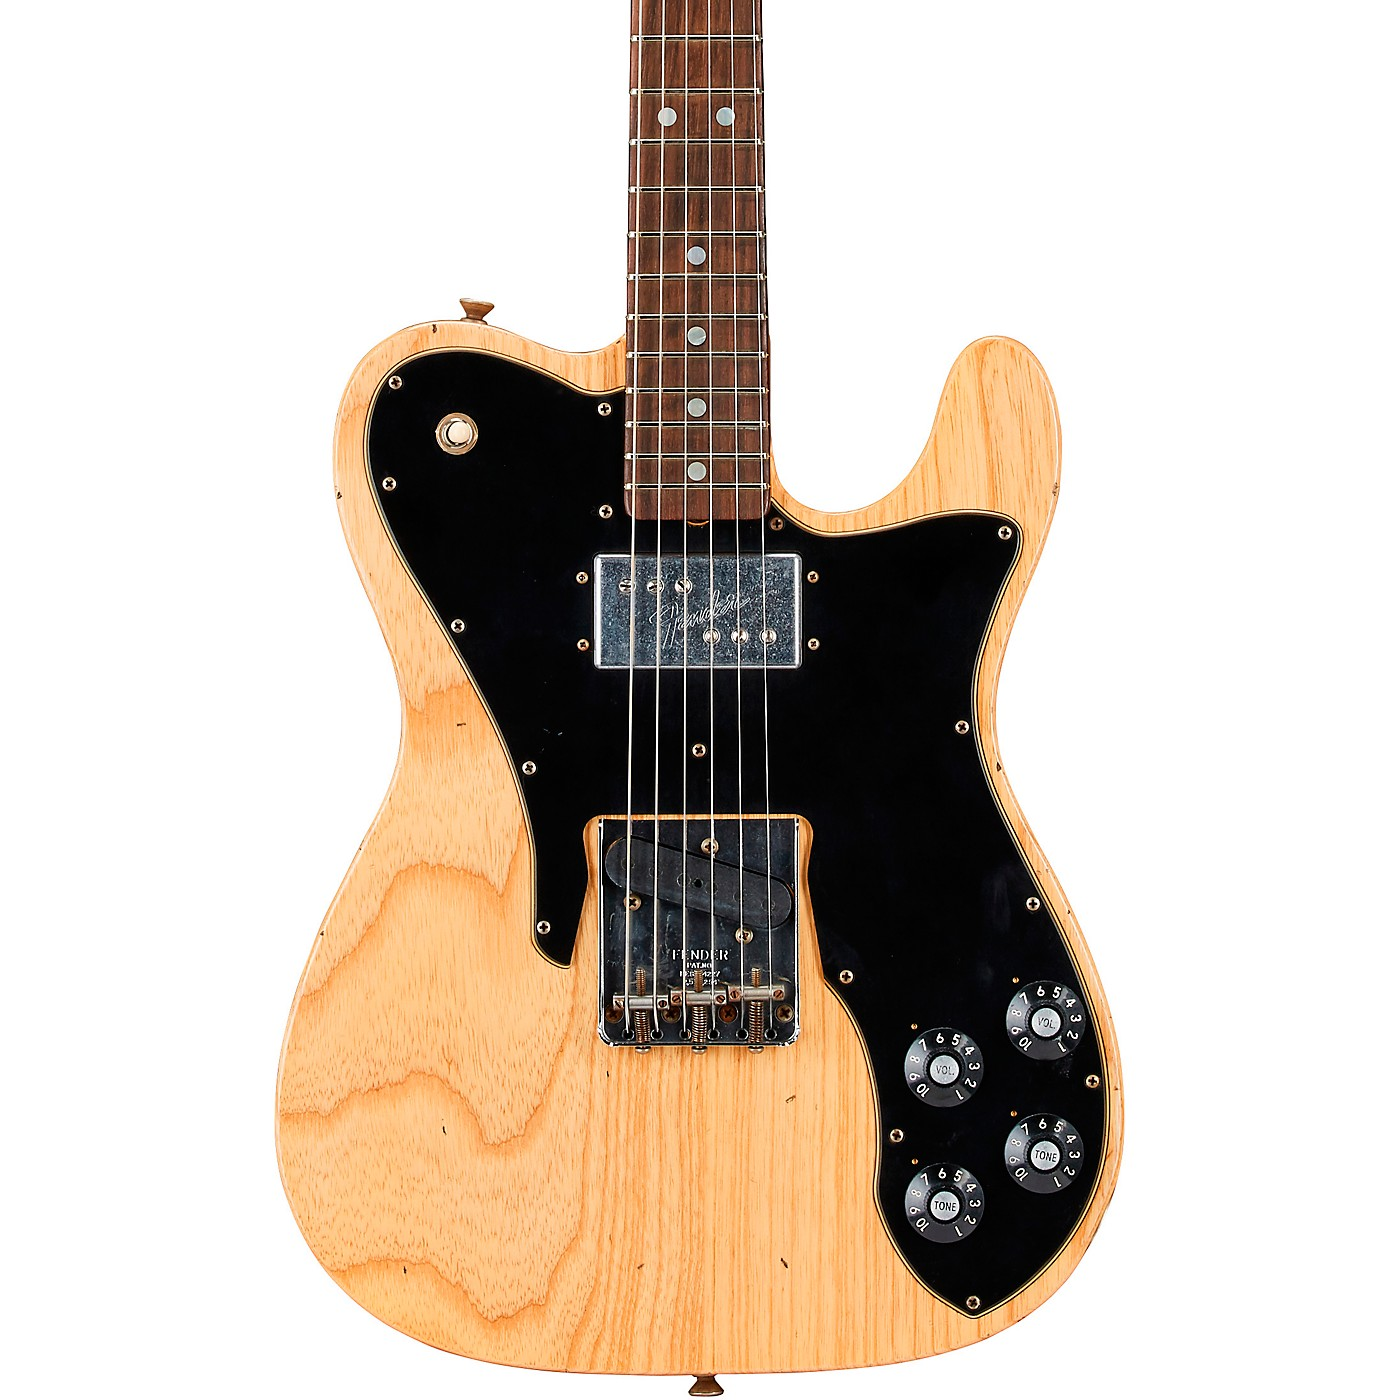 Fender Custom Shop Telecaster Custom Journeyman Relic Limited Edition Electric Guitar thumbnail